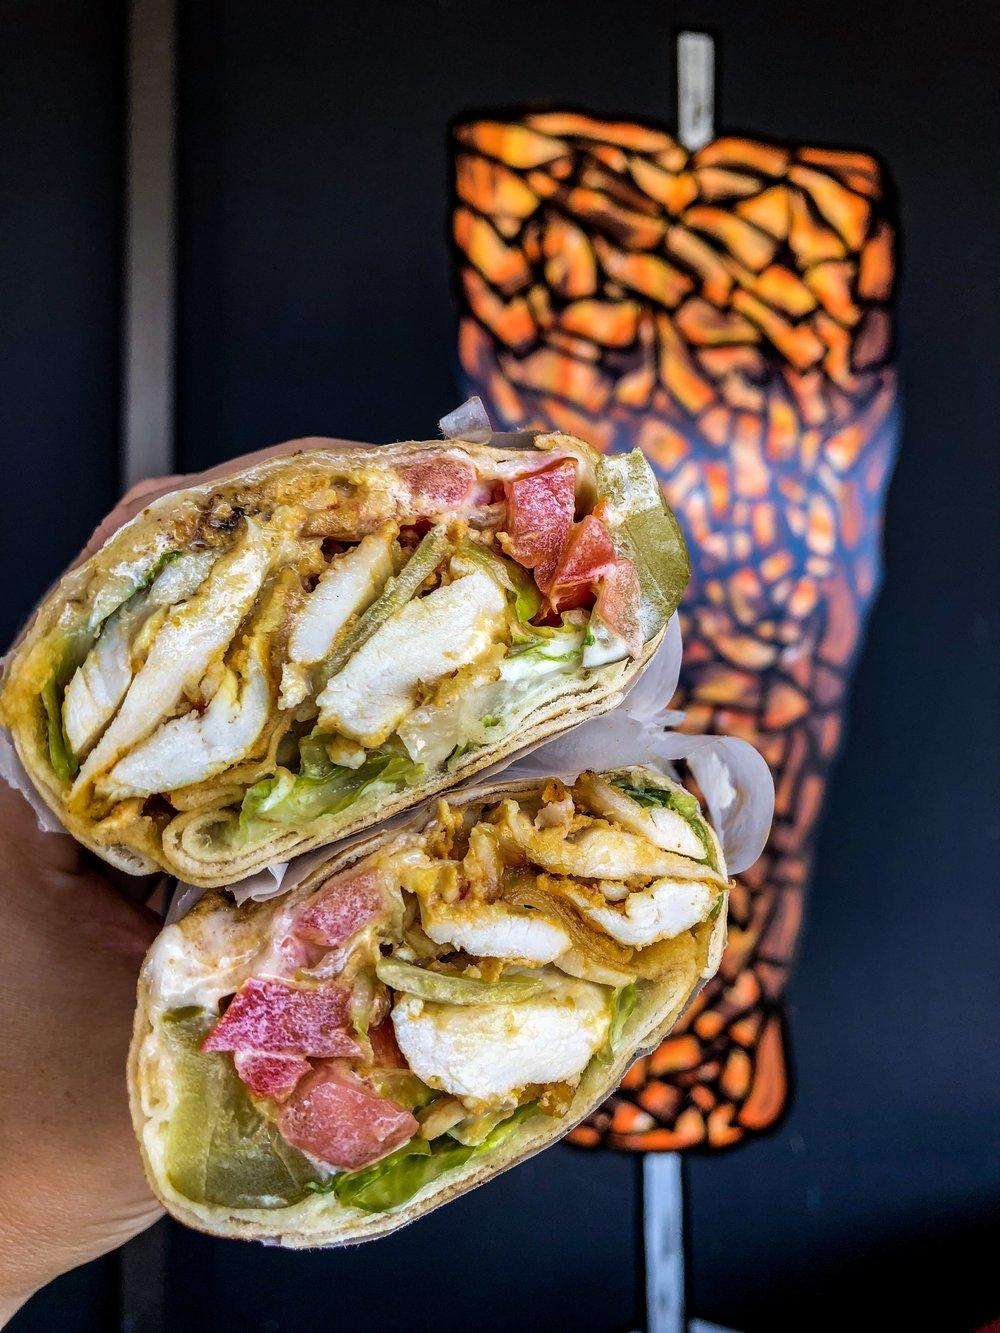 Alsafa - Katy's quality halal meat market since 2009